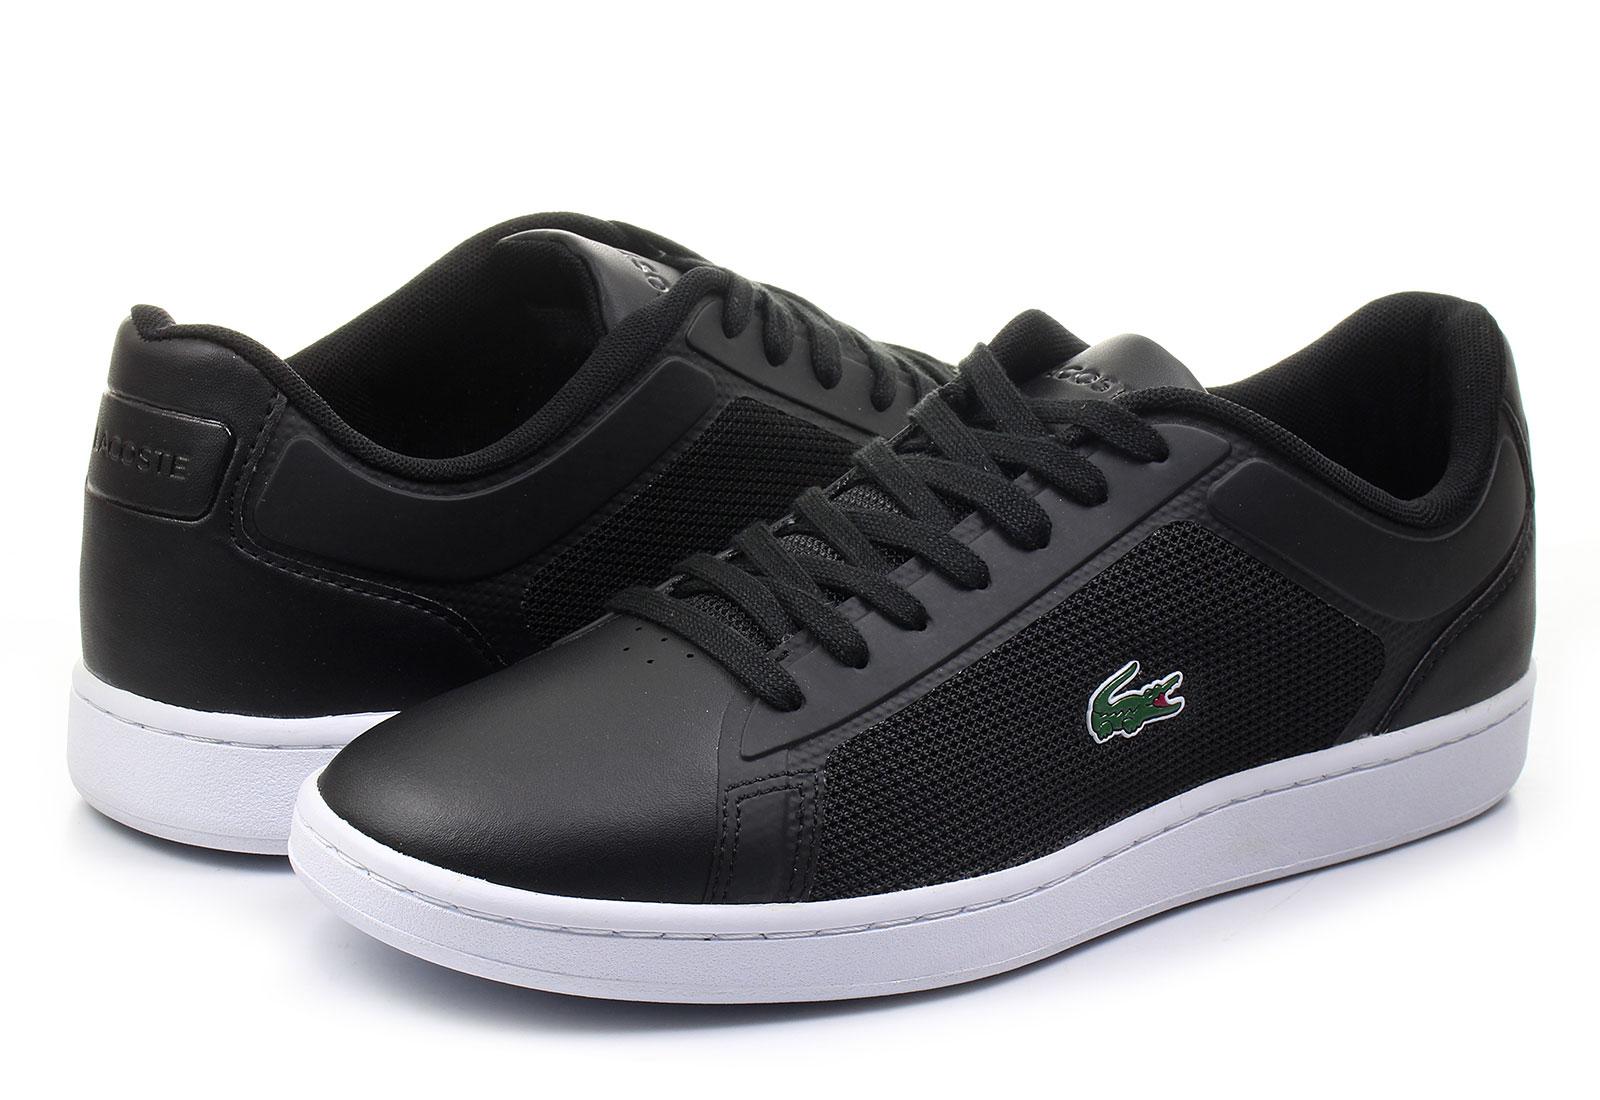 Lacoste Shoes - Endliner - 161spm0008-024